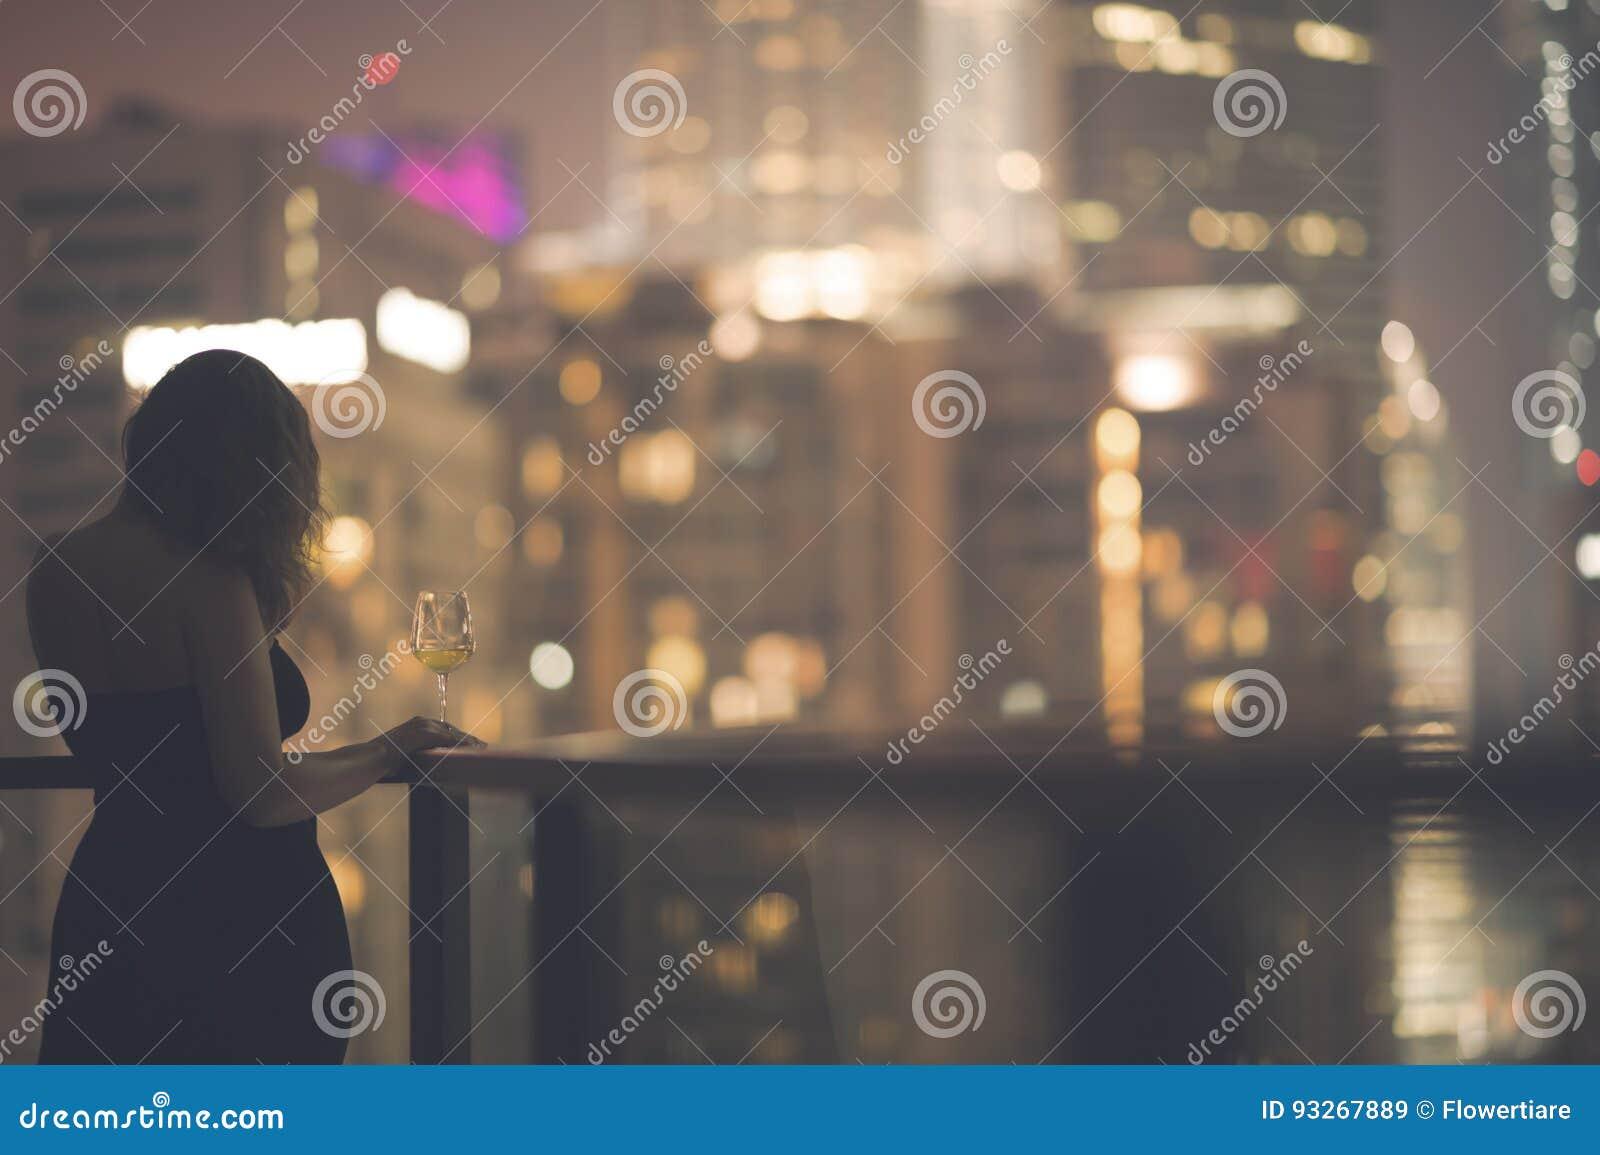 cdd943b20195 Όμορφη νέα γυναίκα στο μπαλκόνι σε ένα μαύρο φόρεμα με ένα ποτήρι του  κρασιού στο υπόβαθρο